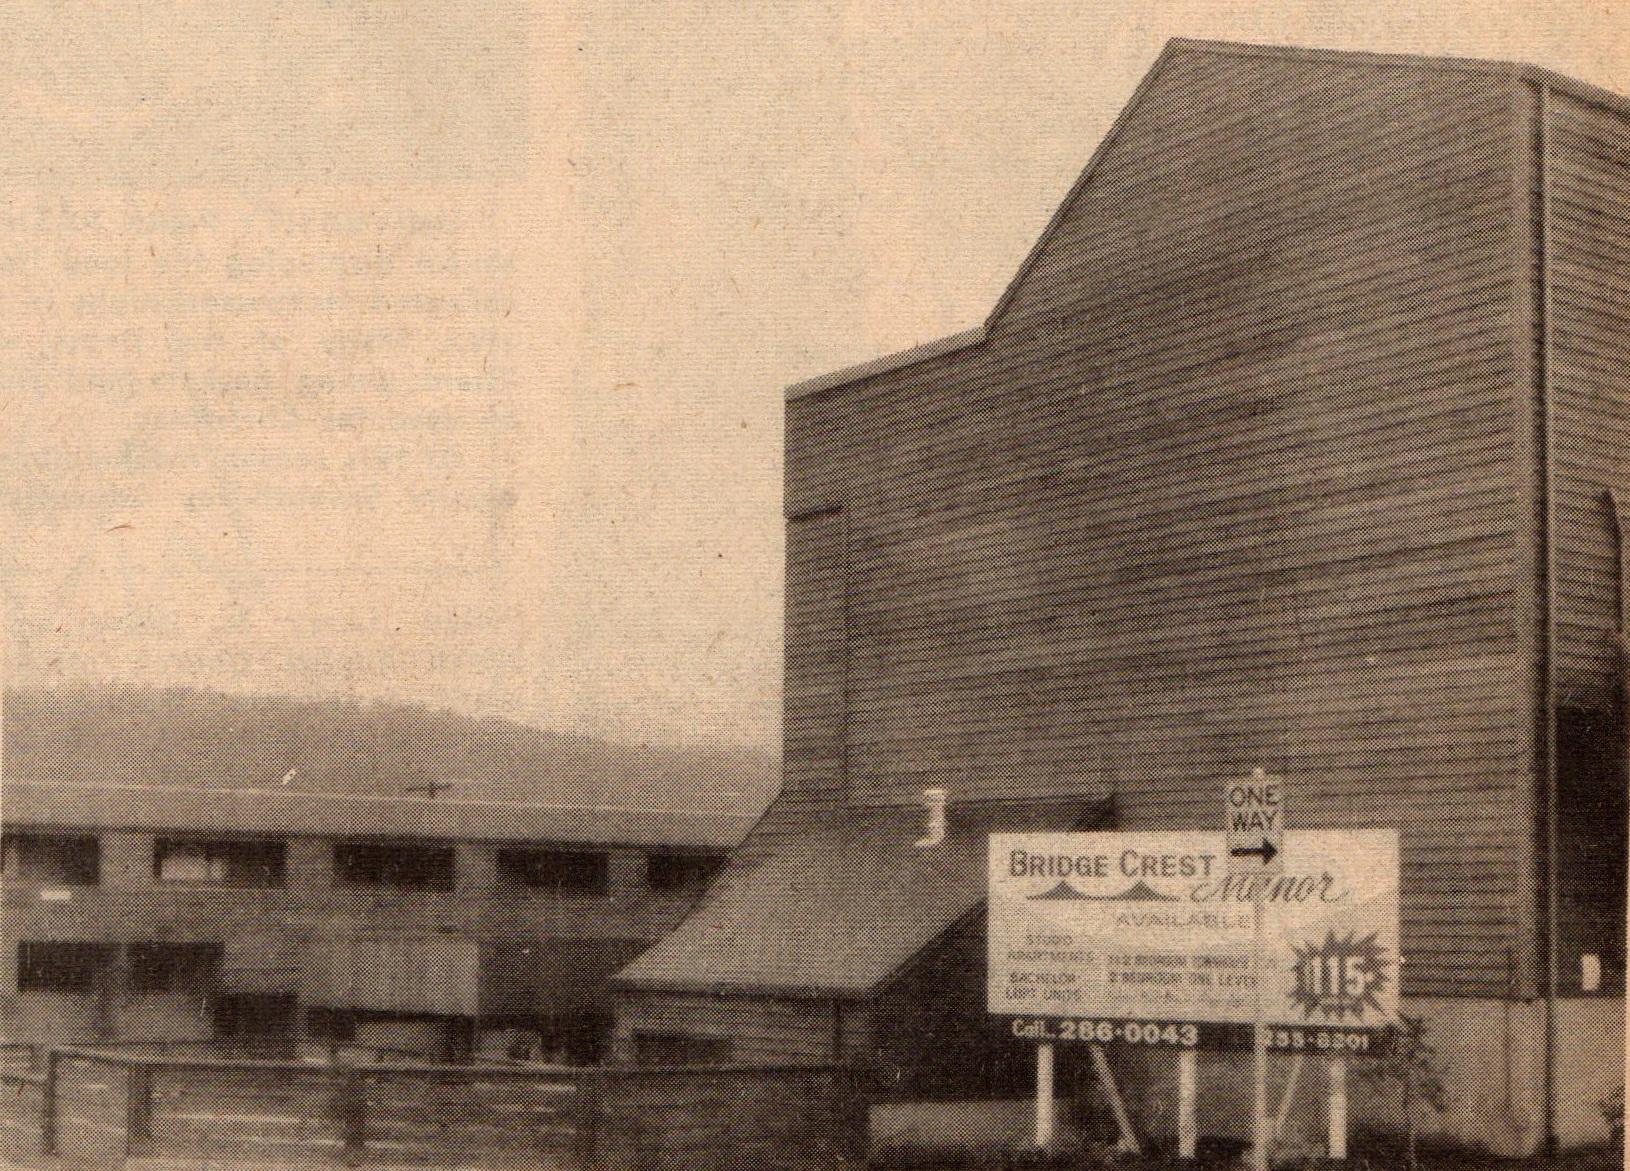 Bridge Crest Manor Apts. 7010 N Alta site of old James John High School opened Dec 1971 jpg (1)